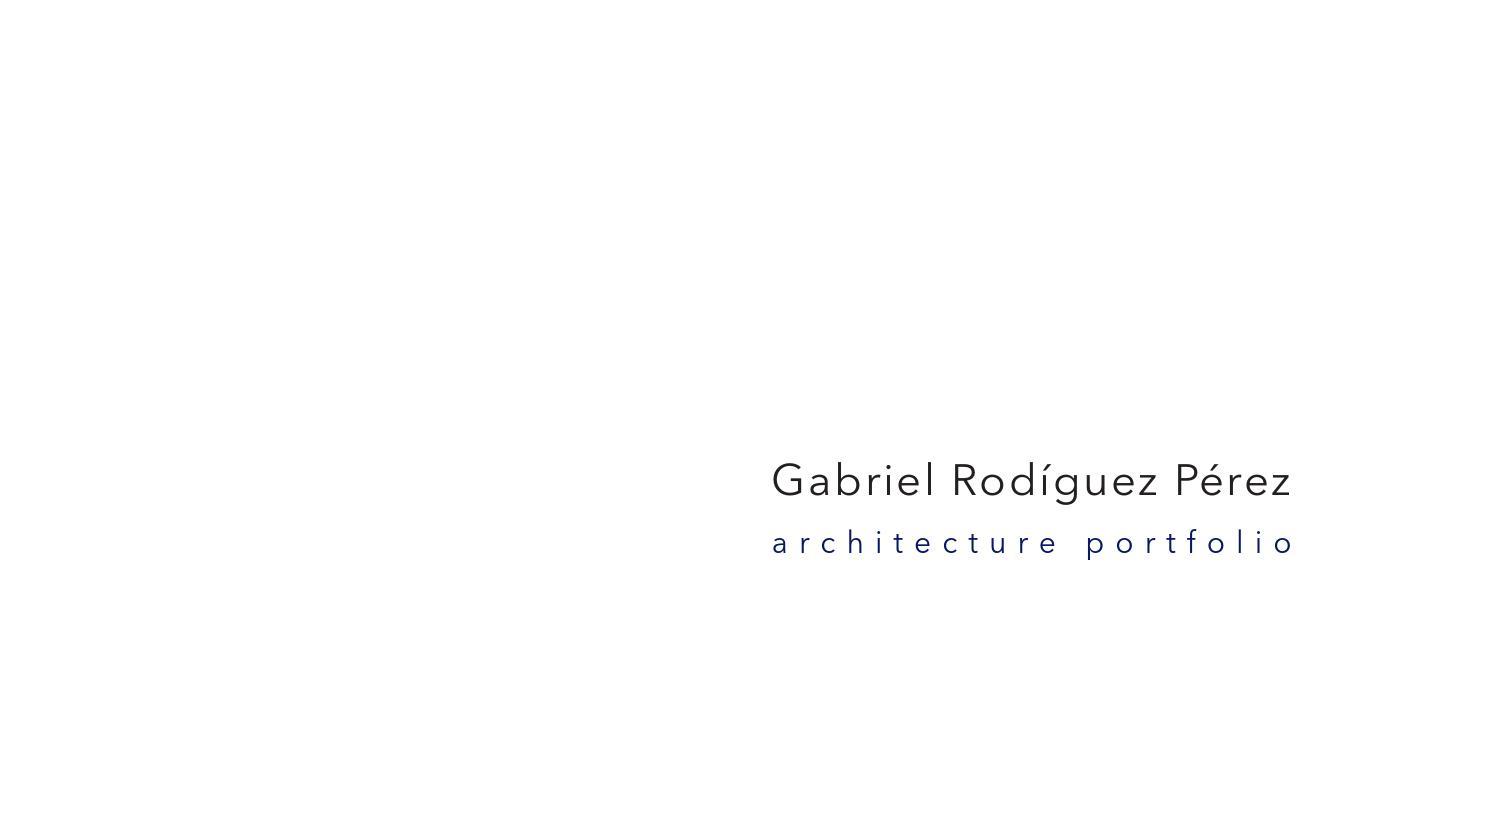 Portfolio arquitectura by gabriel rodr guez p rez issuu - Escuela tecnica superior de arquitectura sevilla ...